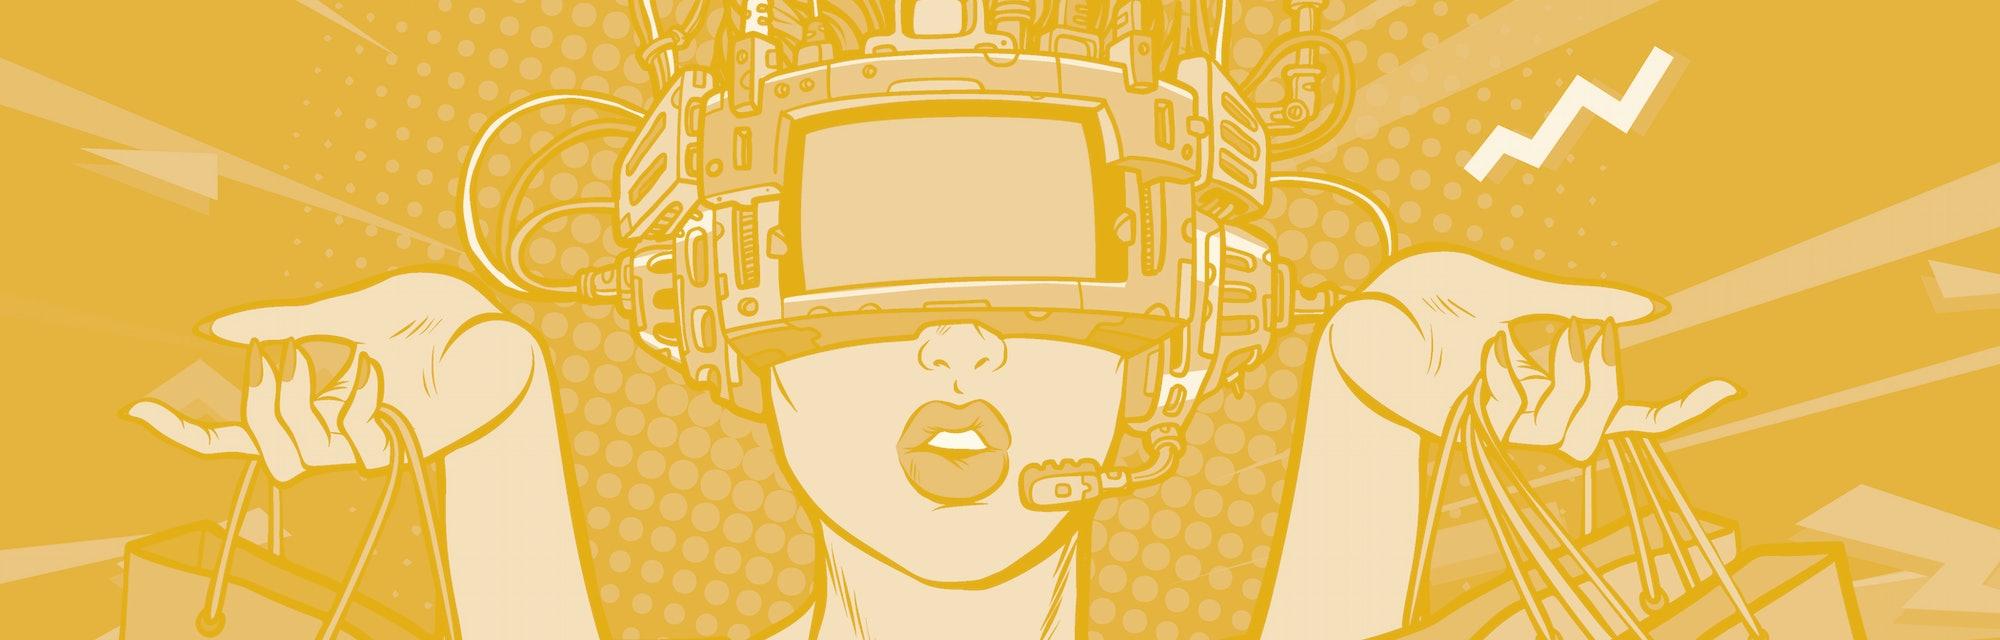 woman shopping on sale. virtual reality VR glasses. Pop art retro vector illustration vintage kitsch